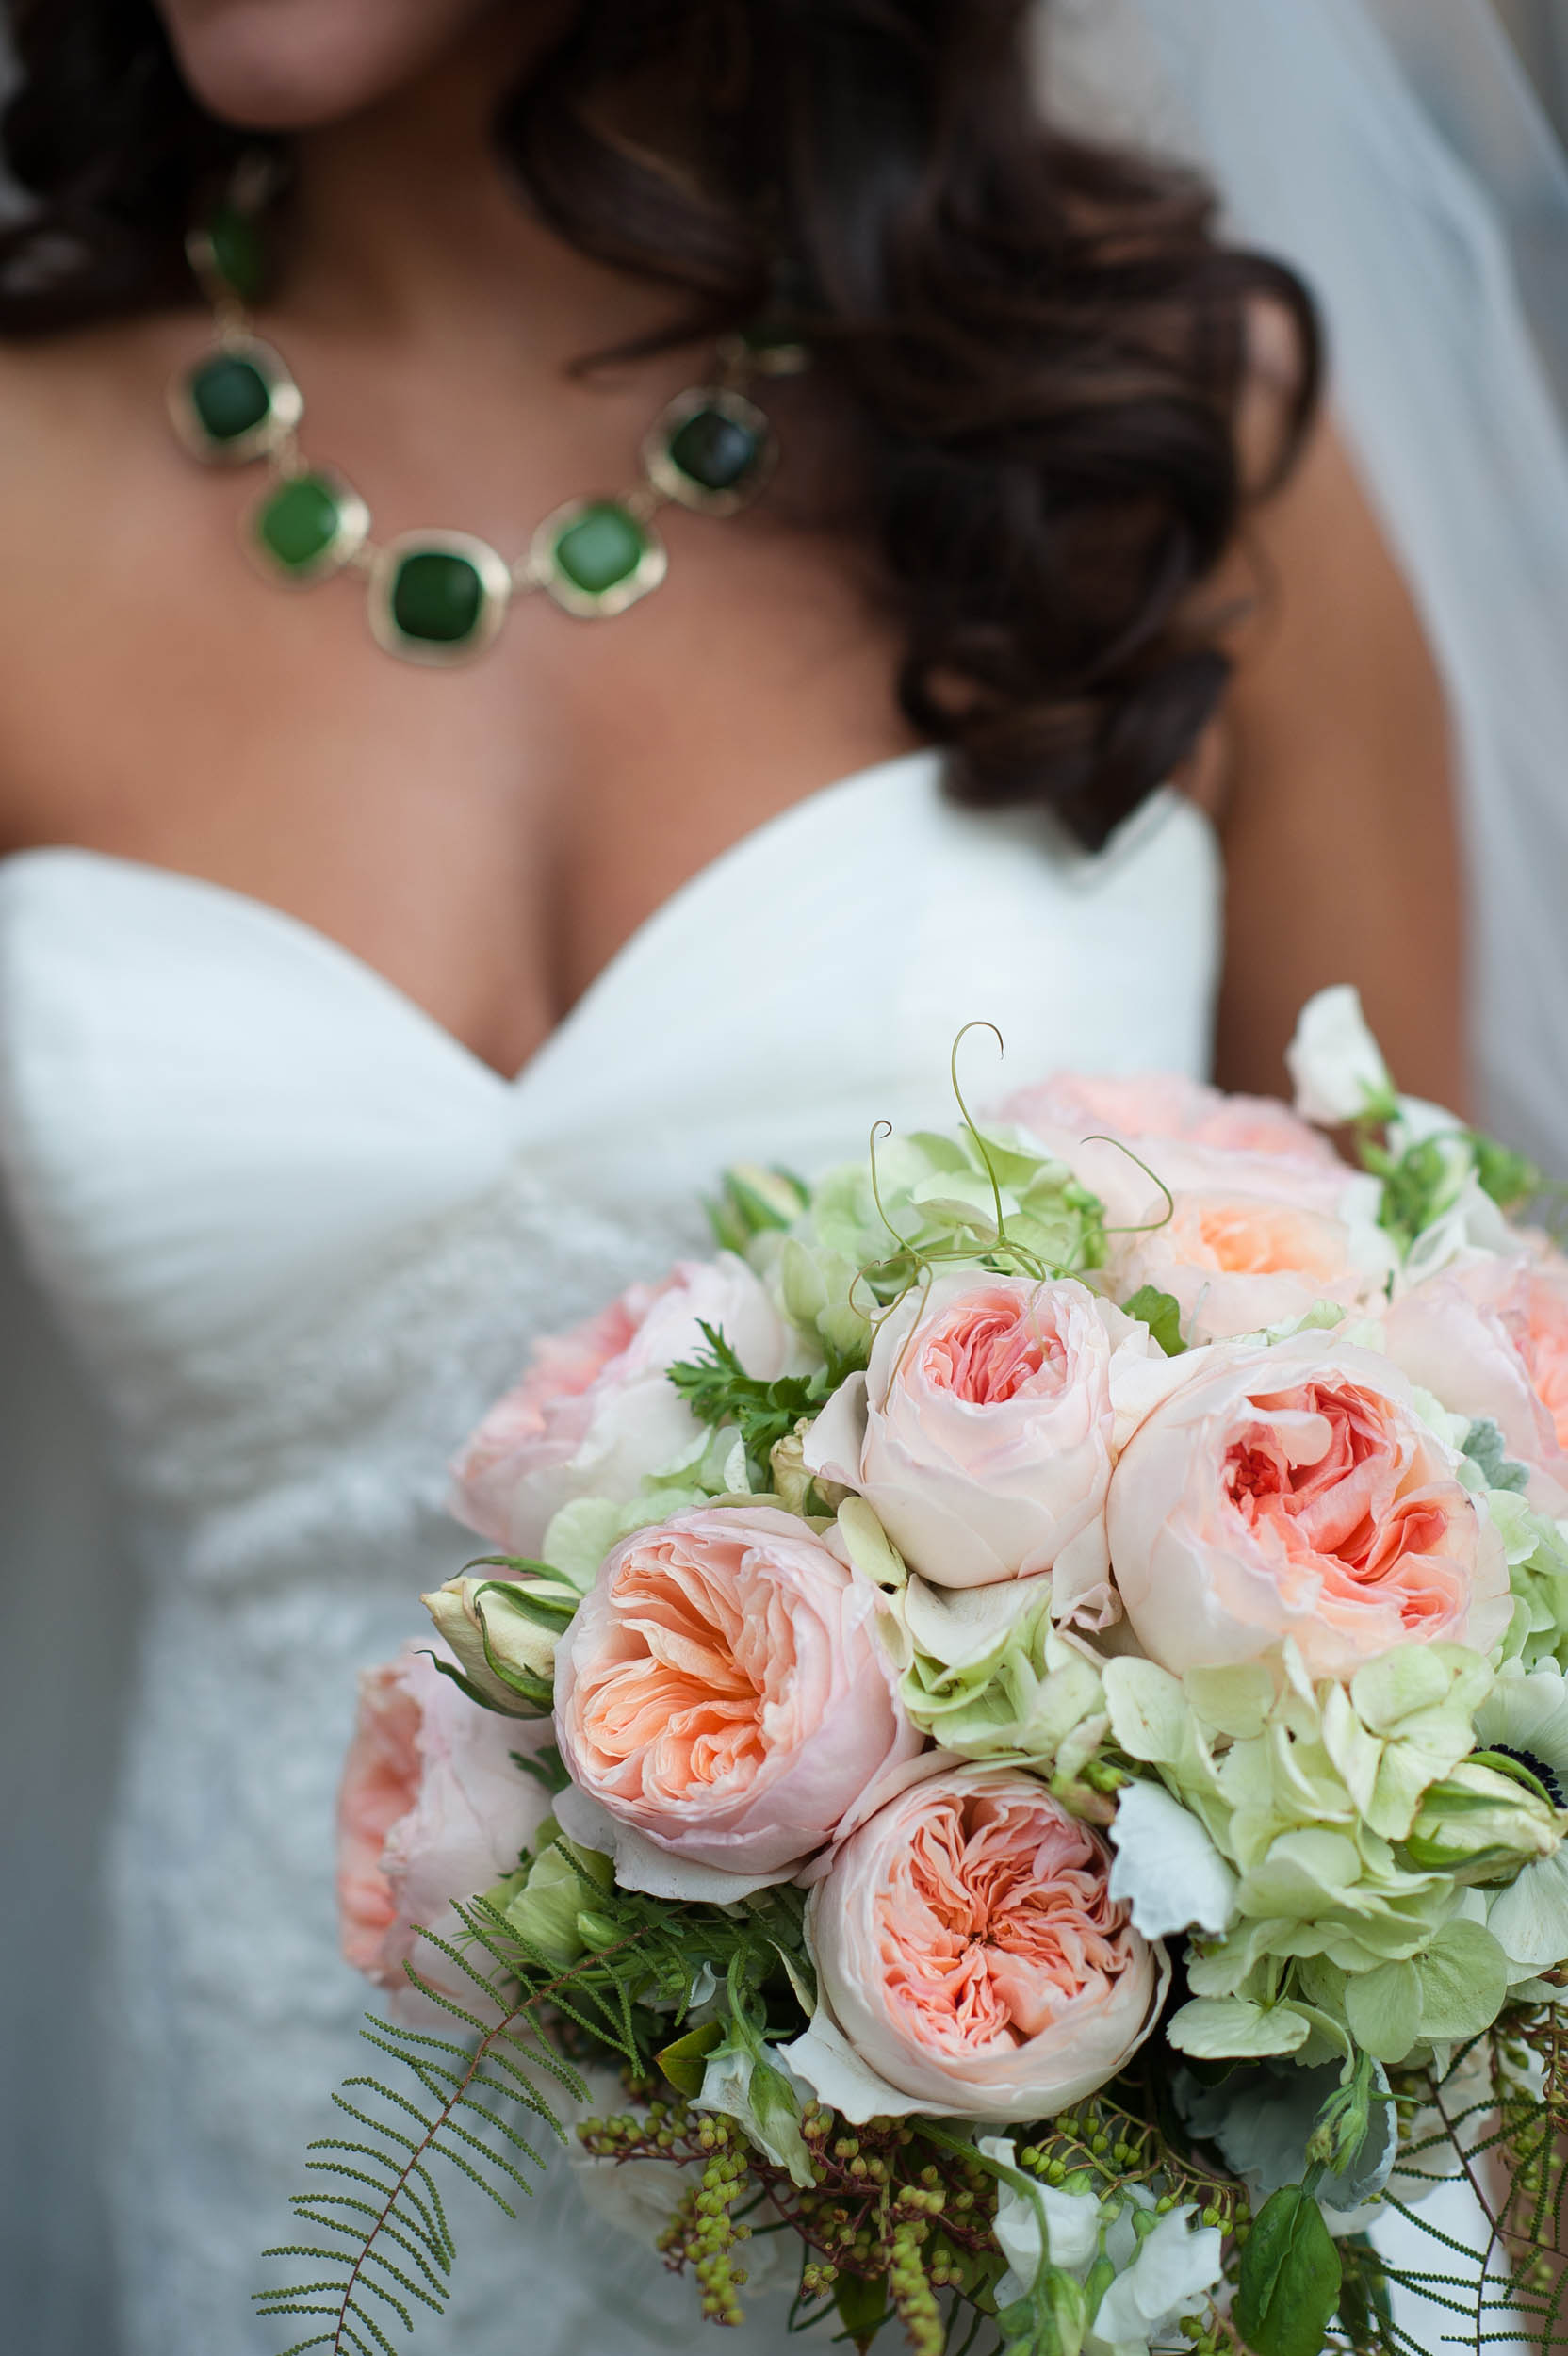 lilacs-florals-wedding-florist-bouquets-hires-022.jpg